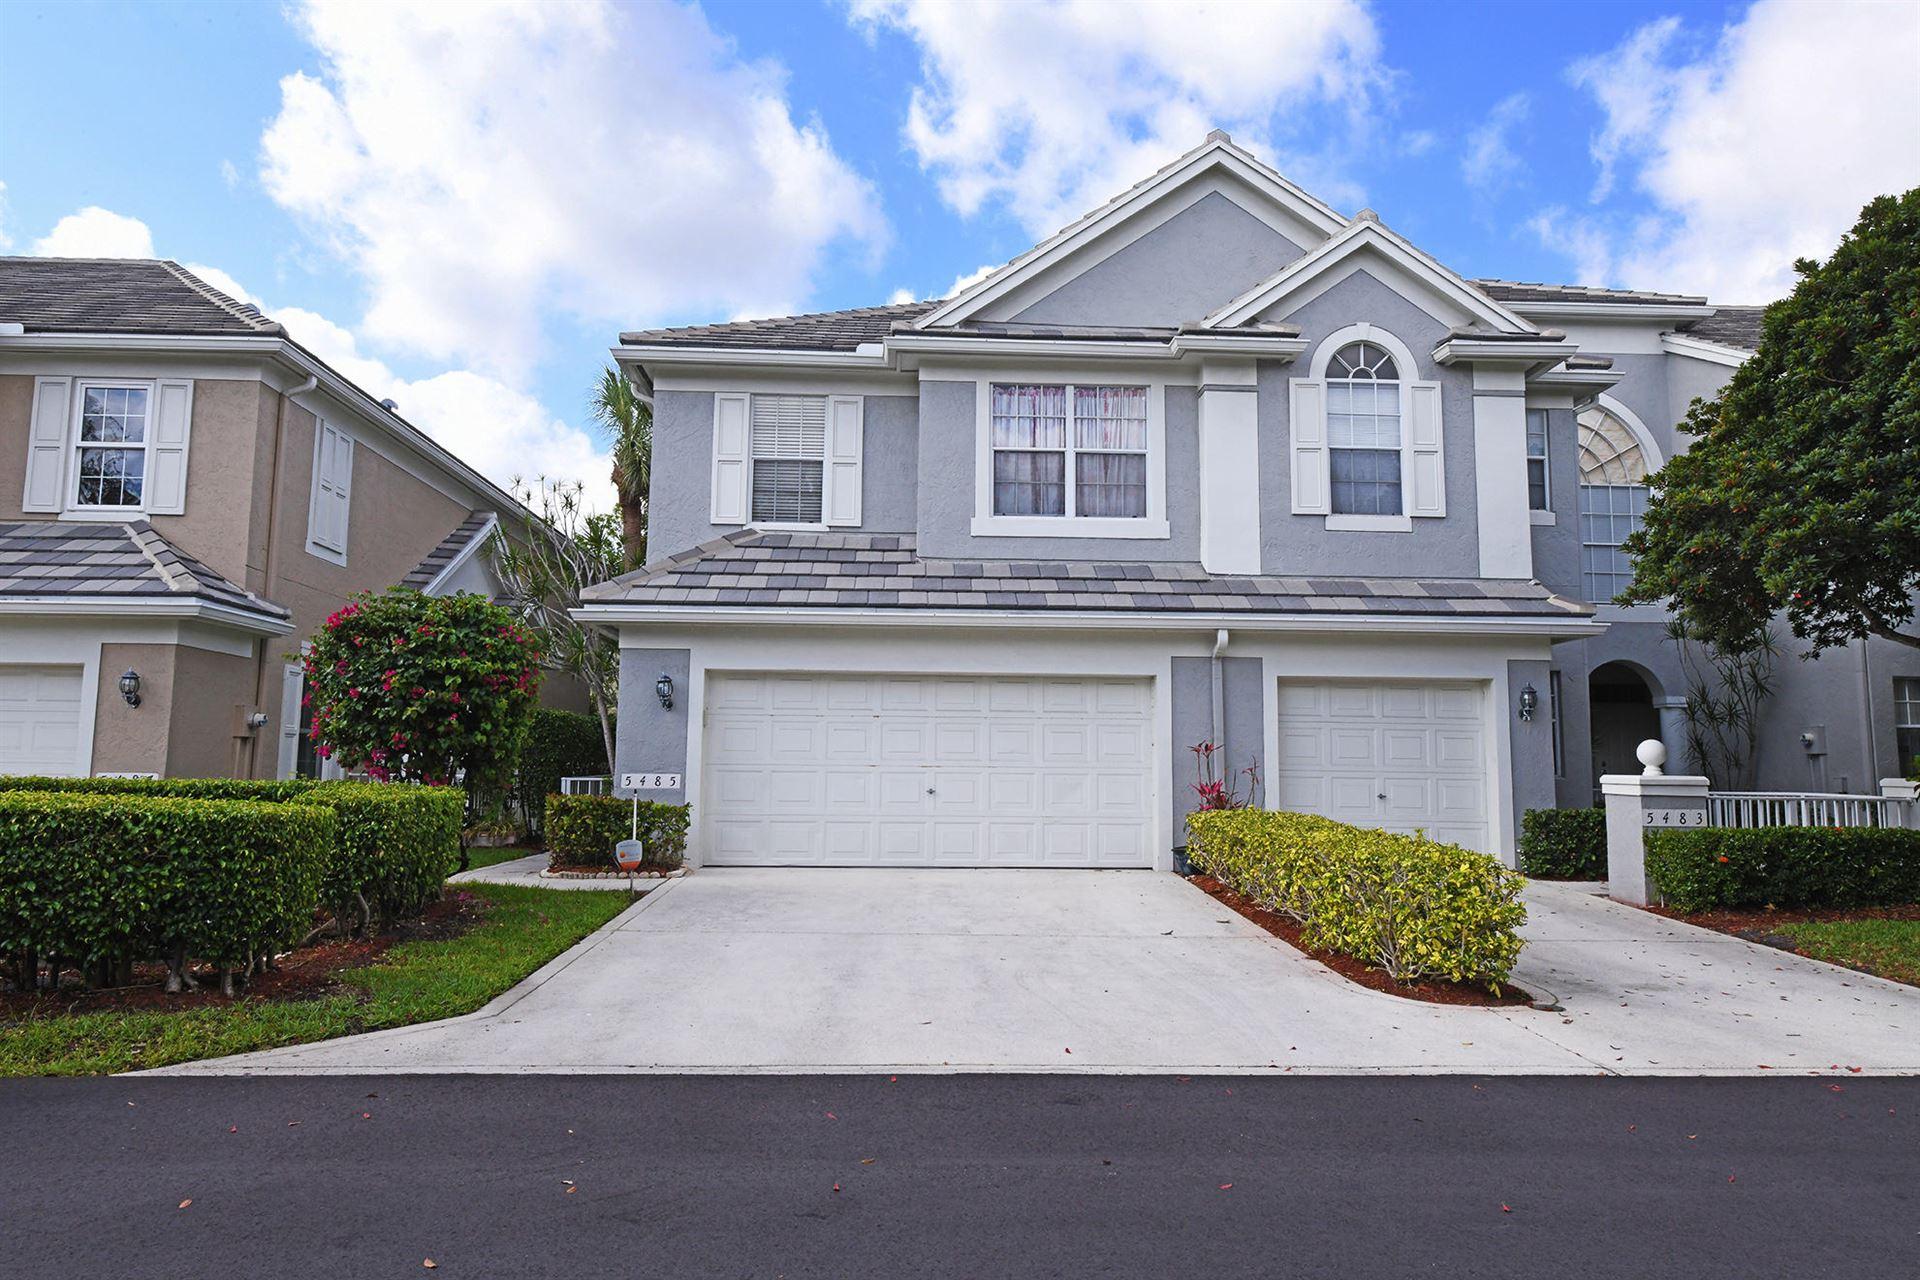 5485 Grand Park Place, Boca Raton, FL 33486 - MLS#: RX-10712626